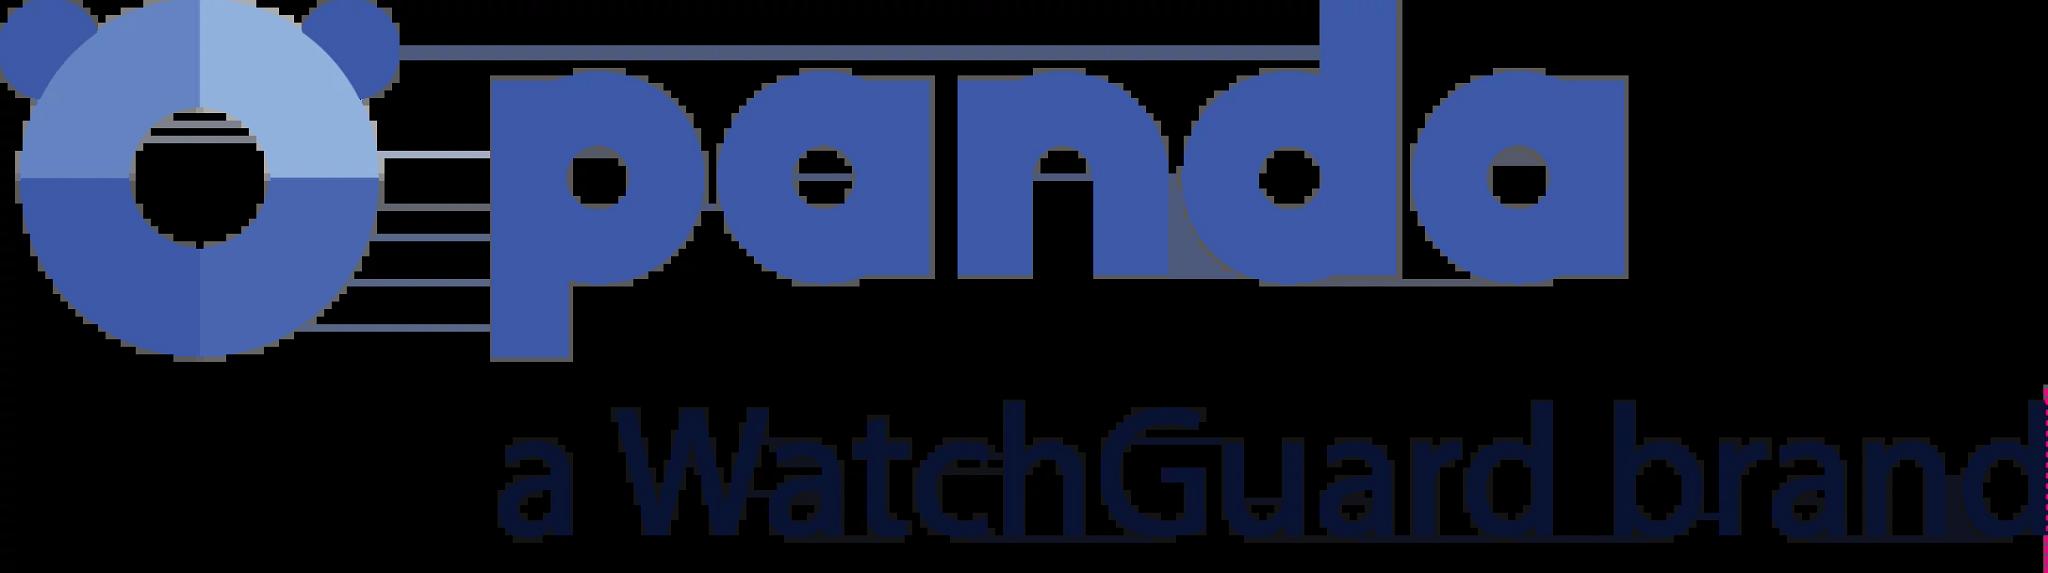 Panda_A_WatchGuard_brand_Logo.png